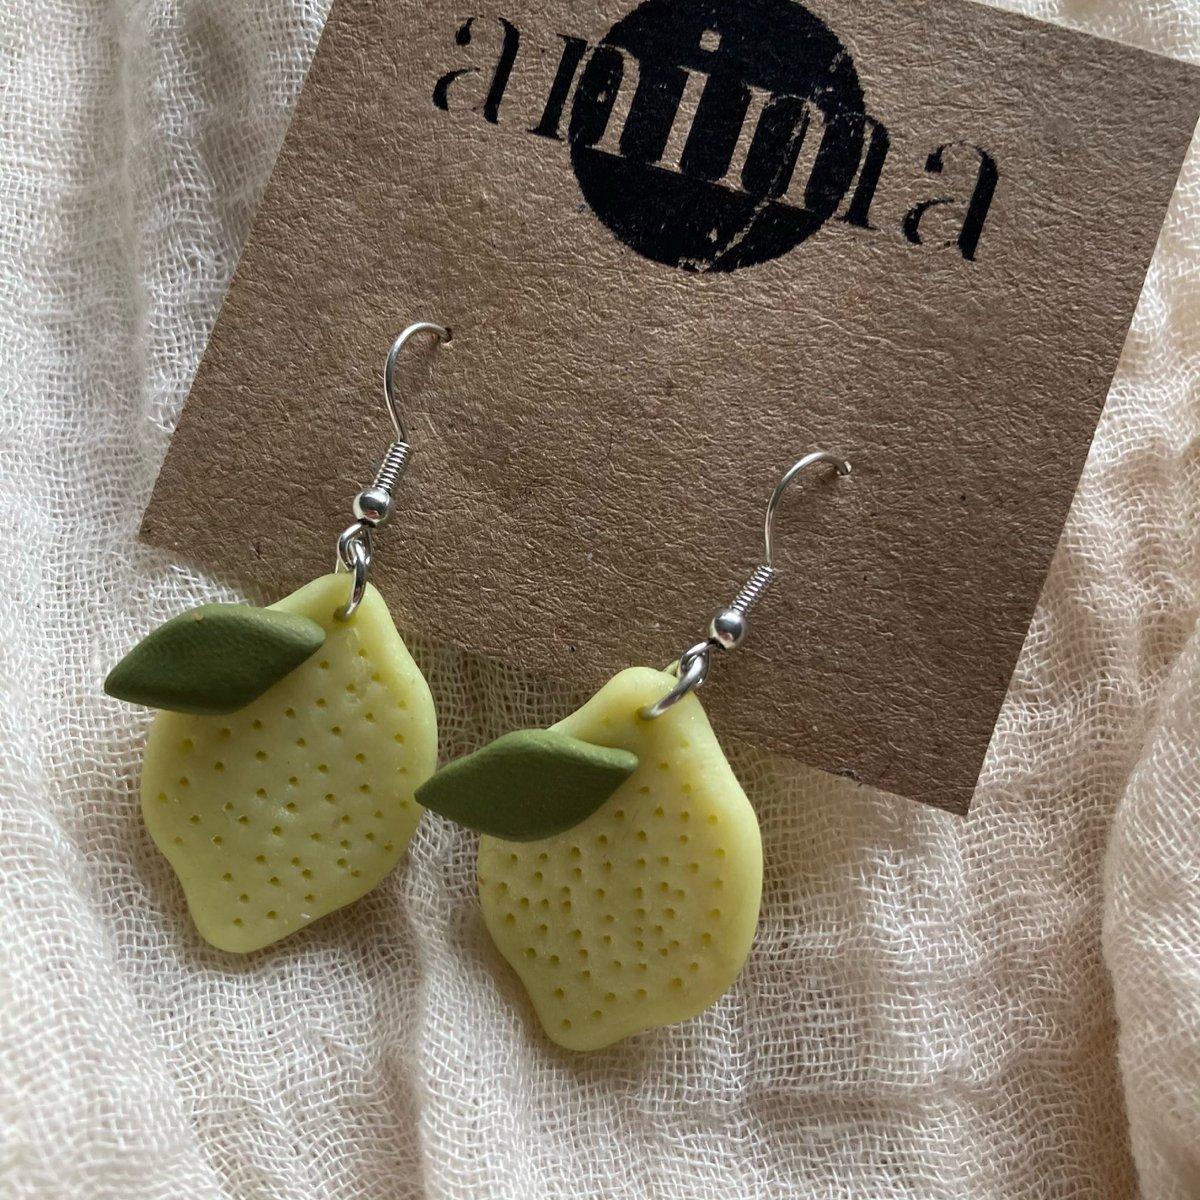 #SmallBusiness #earrings #handmade #SmallBusinessSaturday #discount #kawaii #jewelry #HandmadeInUK #supportsmall #like #gifts #handmadegifts #fashion #lemon #business #promote #share https://t.co/Sh7kk2dZ3b